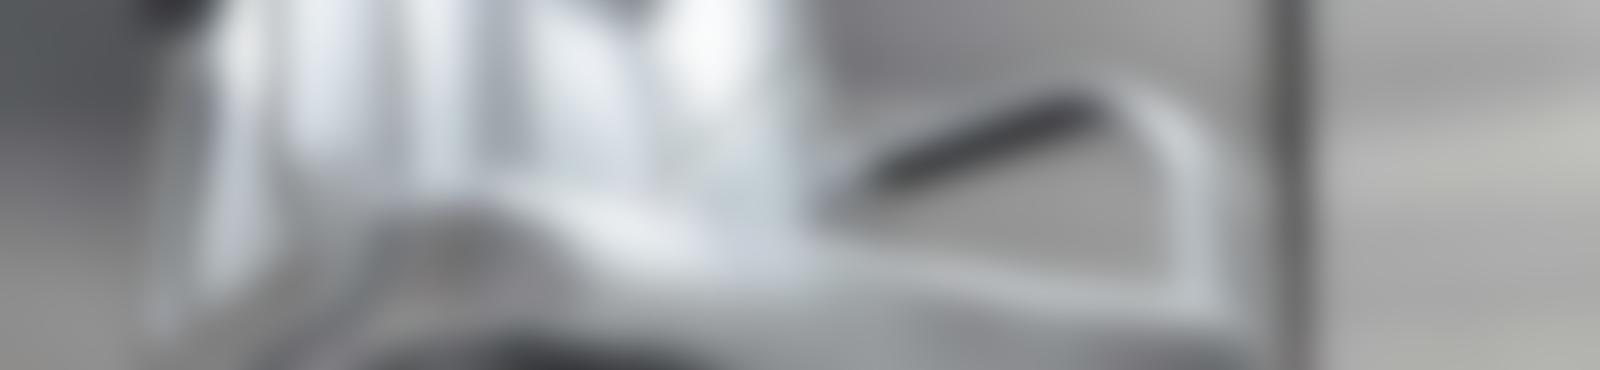 Blurred 2f20dff3 7f18 432a 8a2c 42ed308beac6